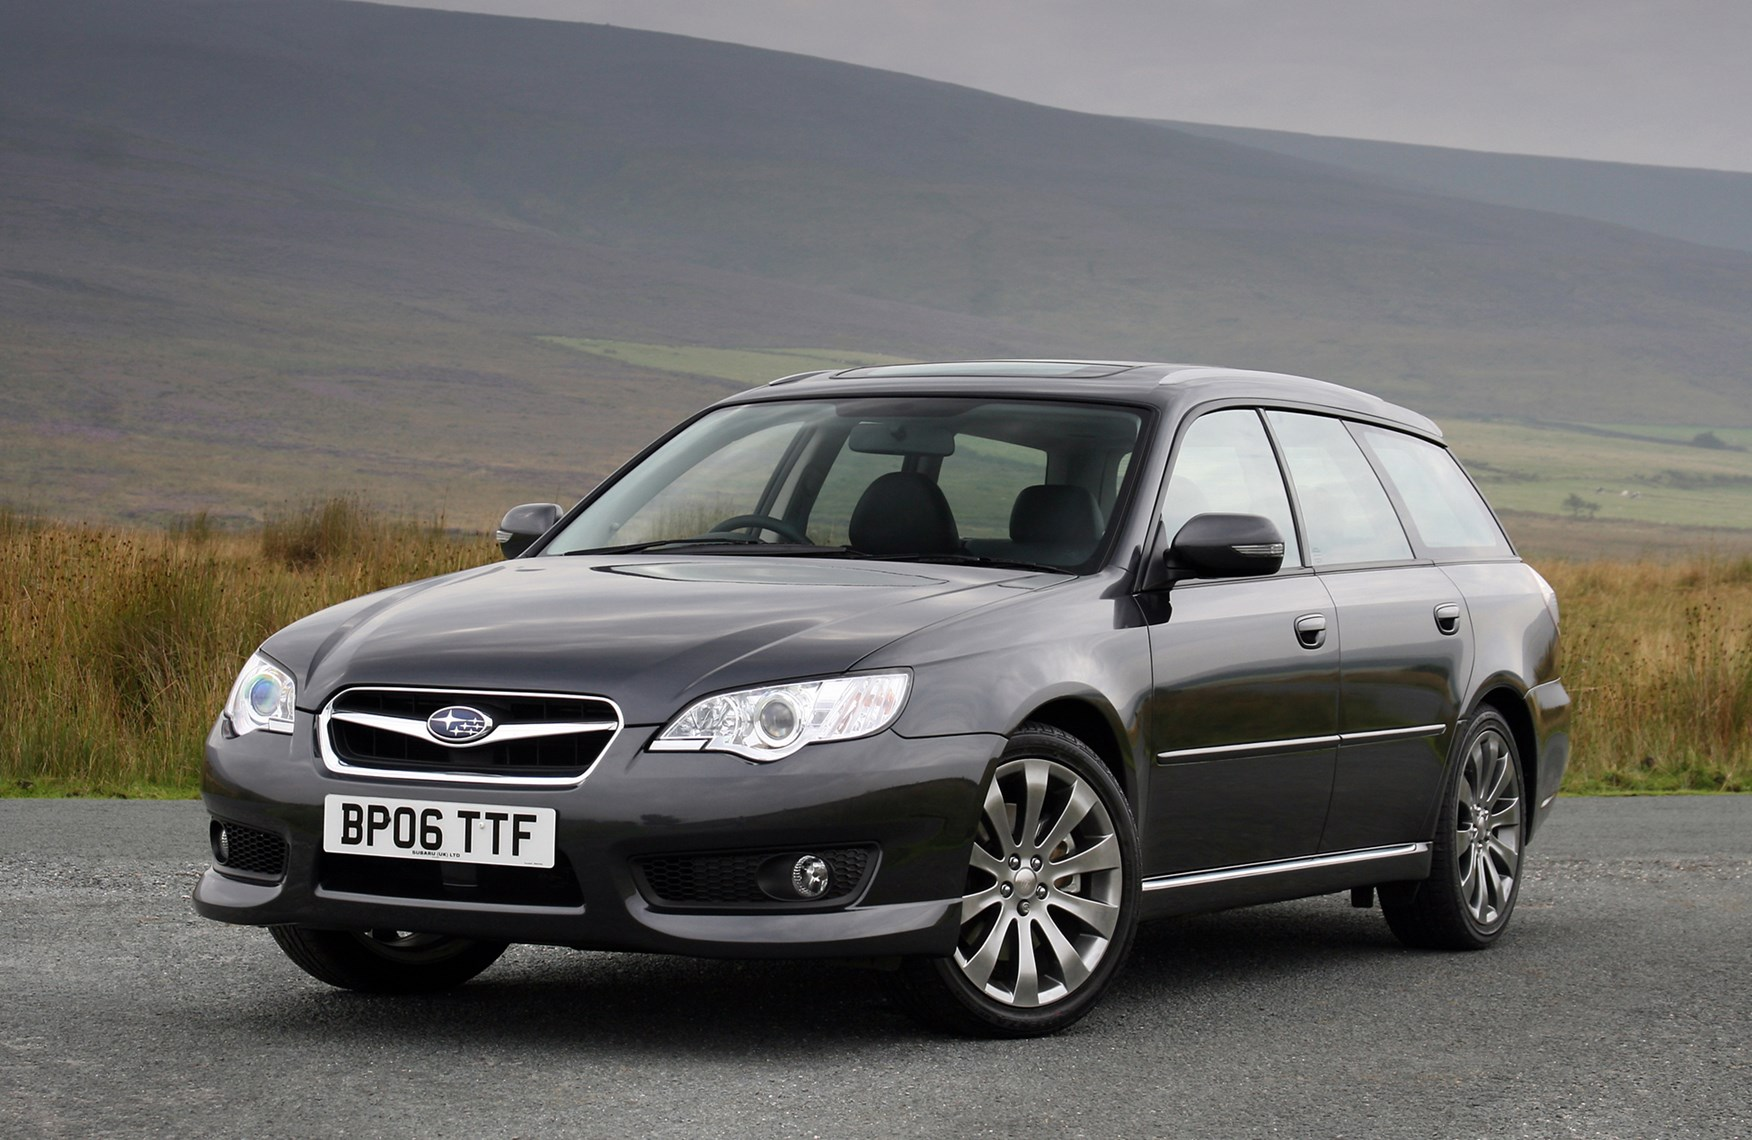 Used Subaru Wrx Sti For Sale >> Subaru Legacy Sports Tourer Review (2003 - 2009) | Parkers